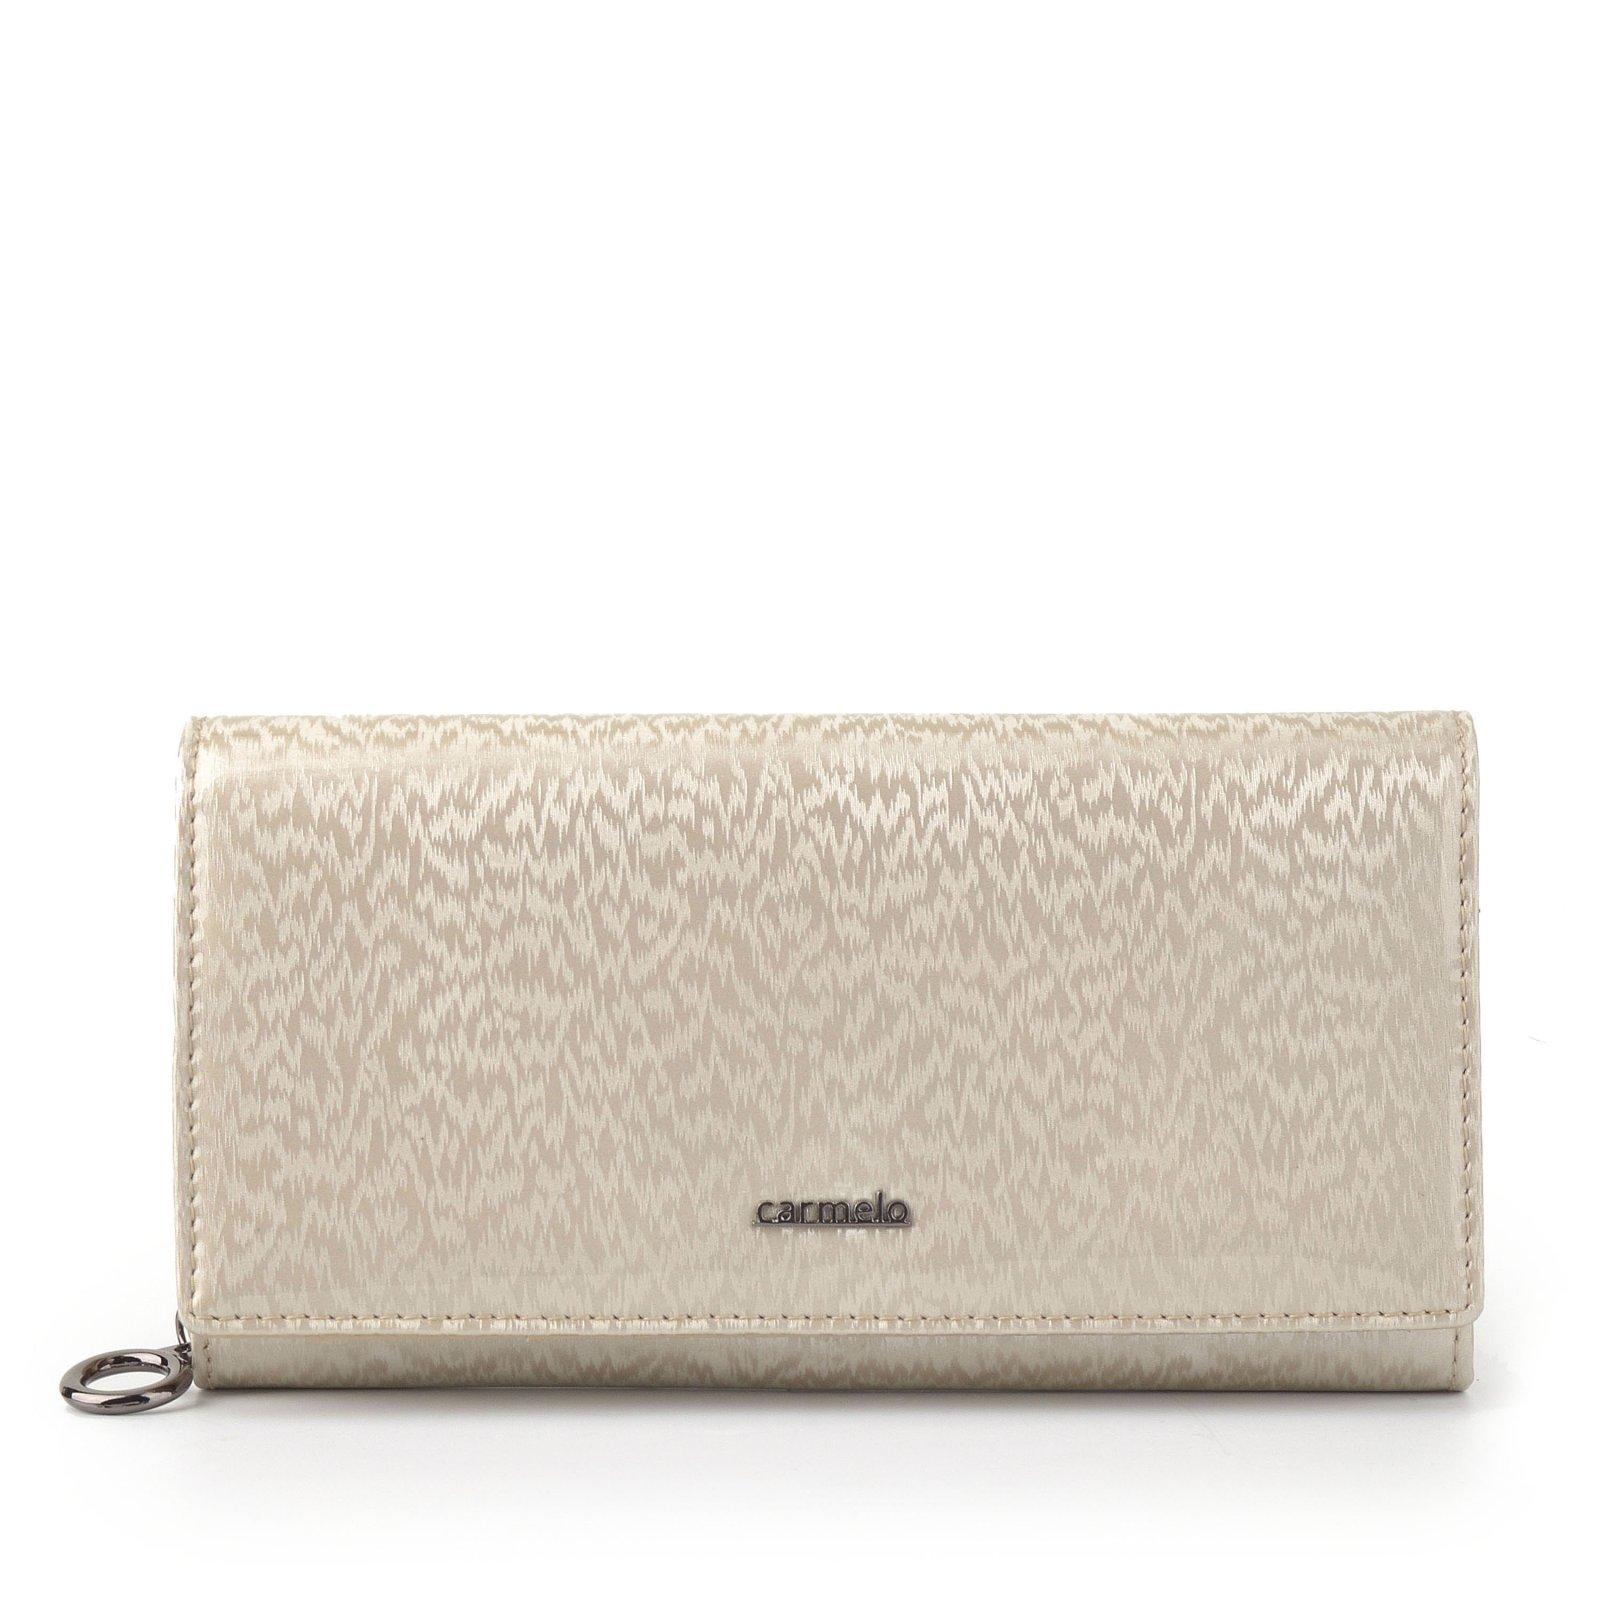 Kožená peněženka Carmelo – 2100 H K